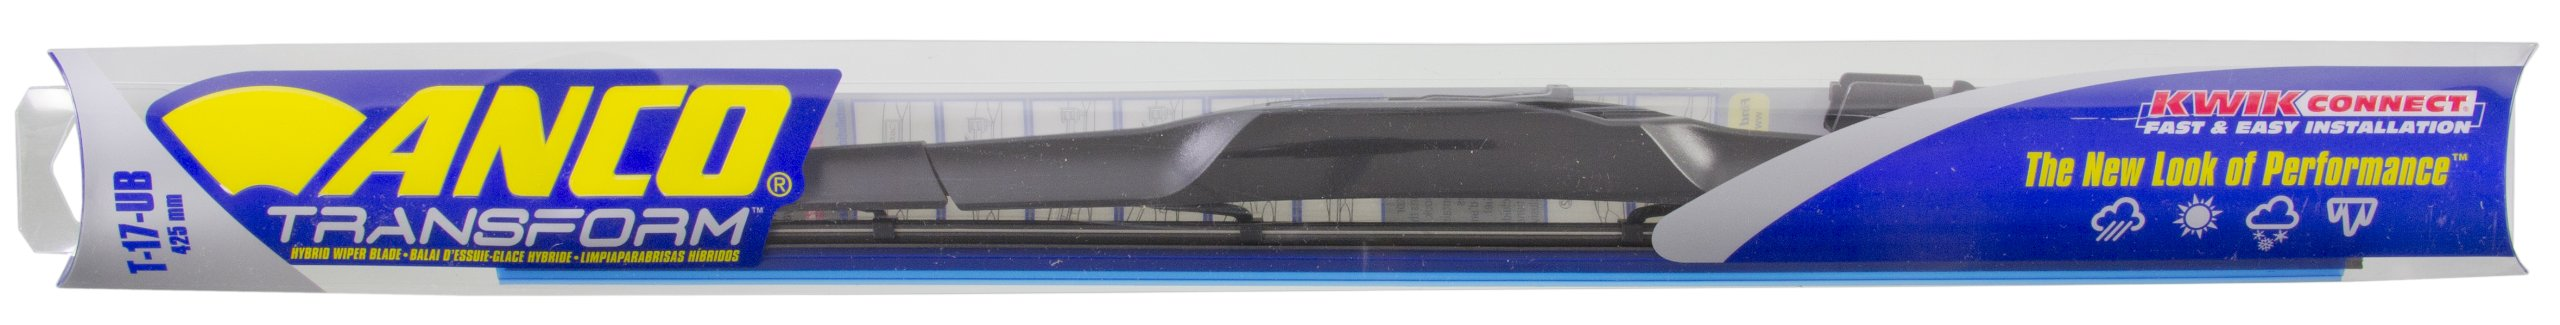 Pack of 1 12 Anco 53-12 Heavy Duty Wiper Refill